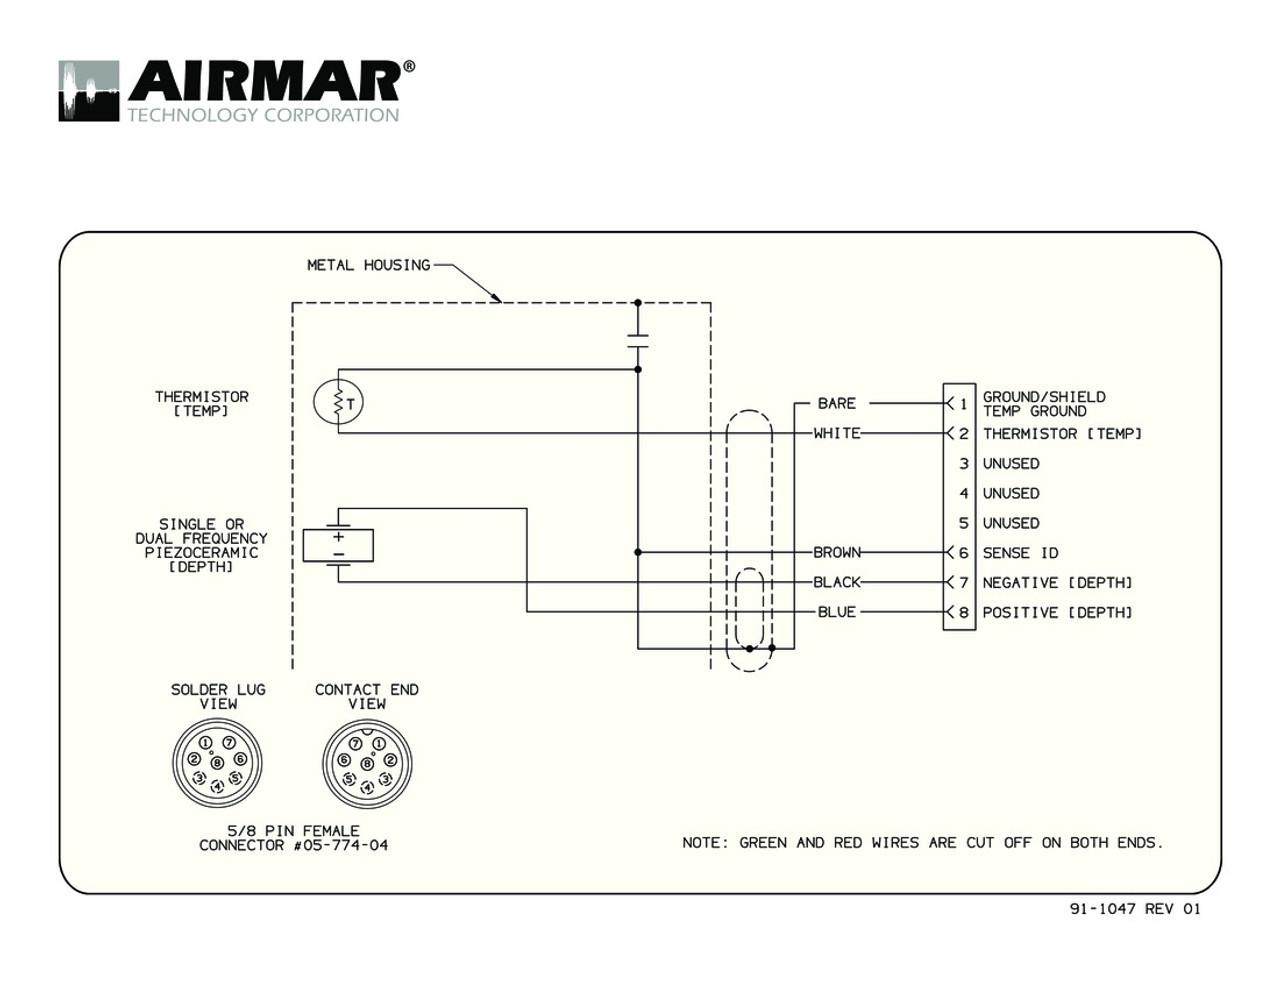 medium resolution of airmar wiring diagram garmin b117 8 pin d t blue bottle marine 8